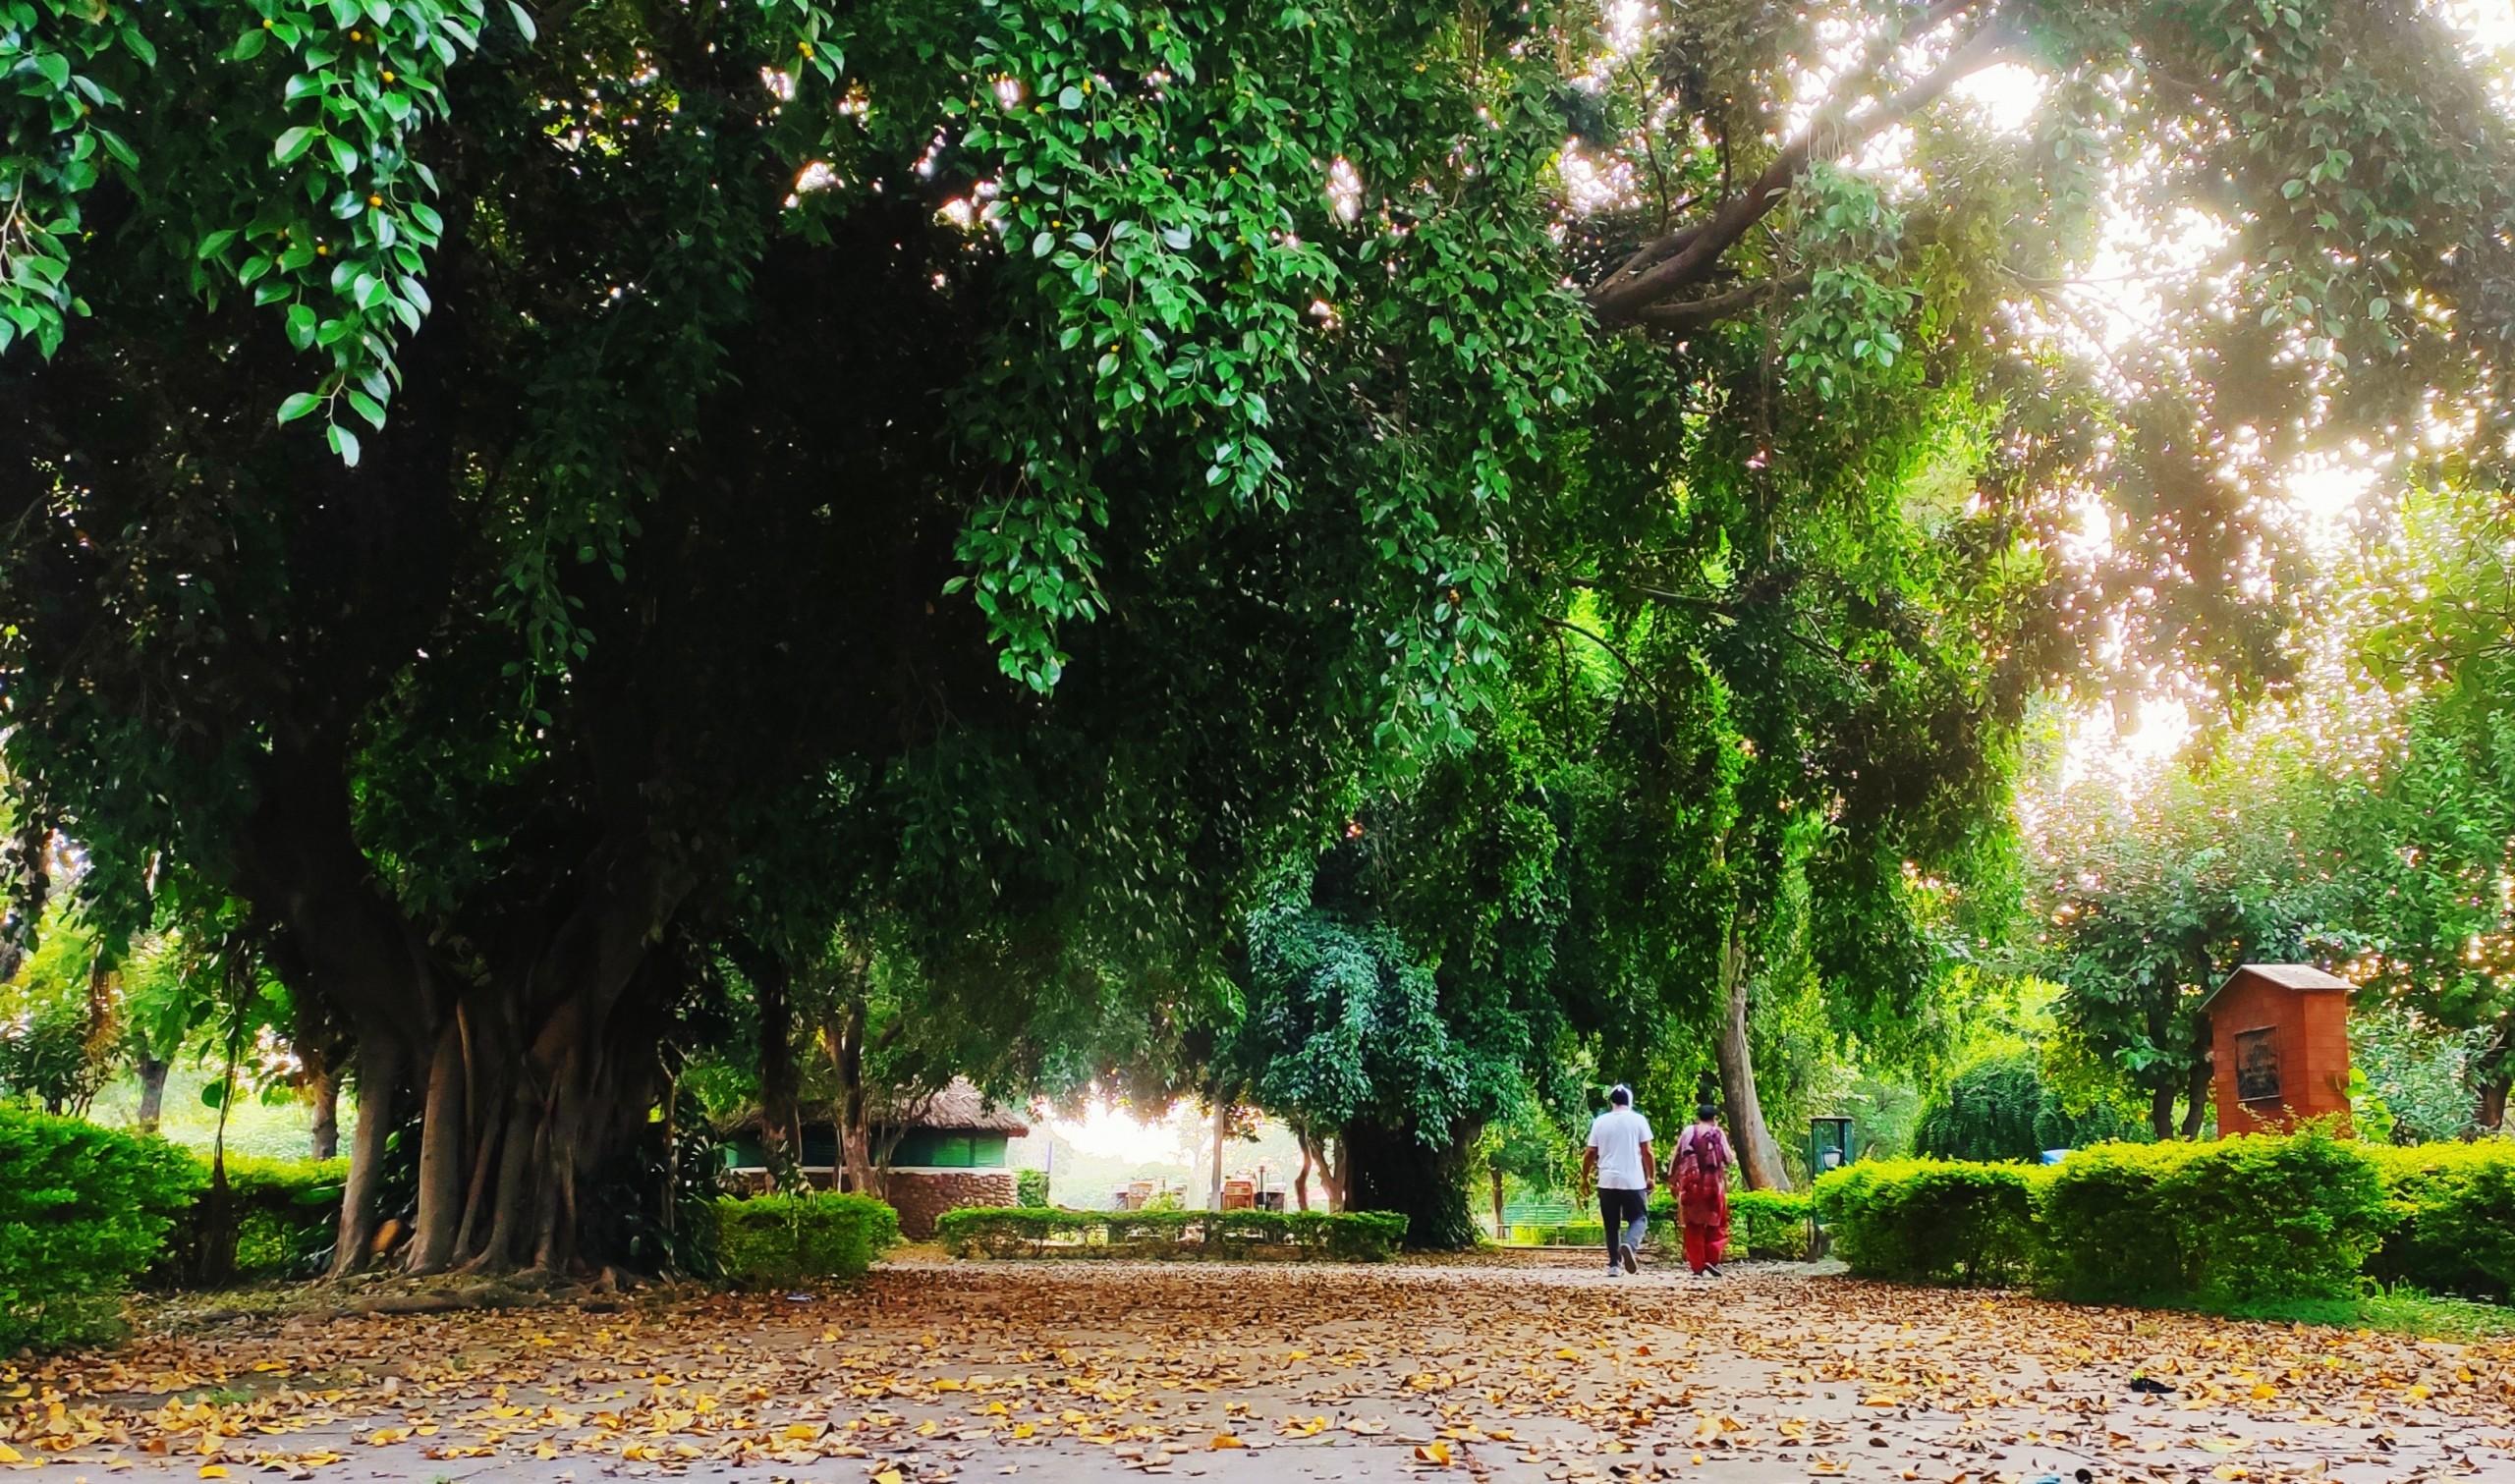 Park for walking